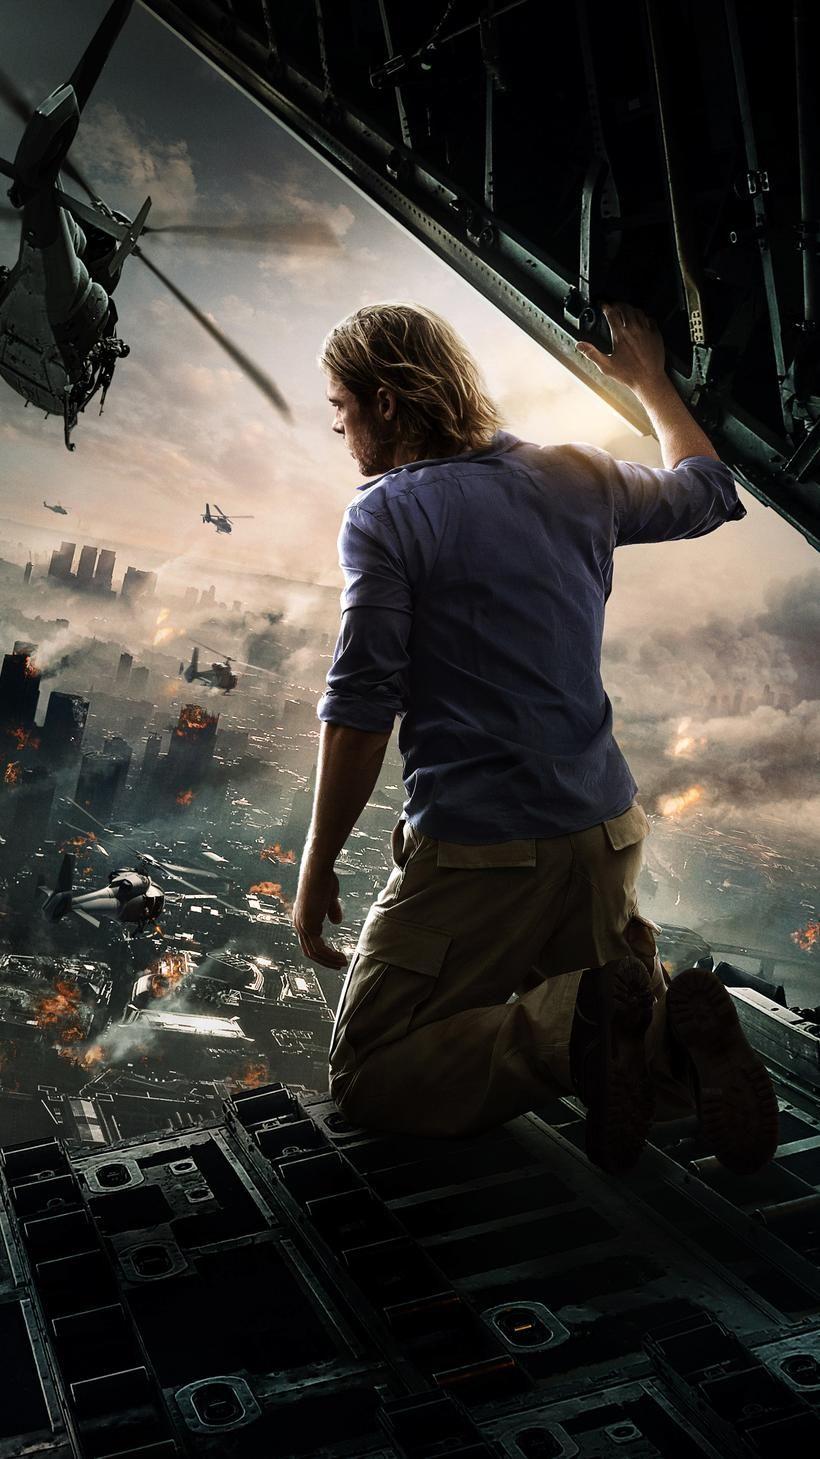 The Hunger Games: Mockingjay - Part 1 (2014) Phone Wallpaper | Moviemania